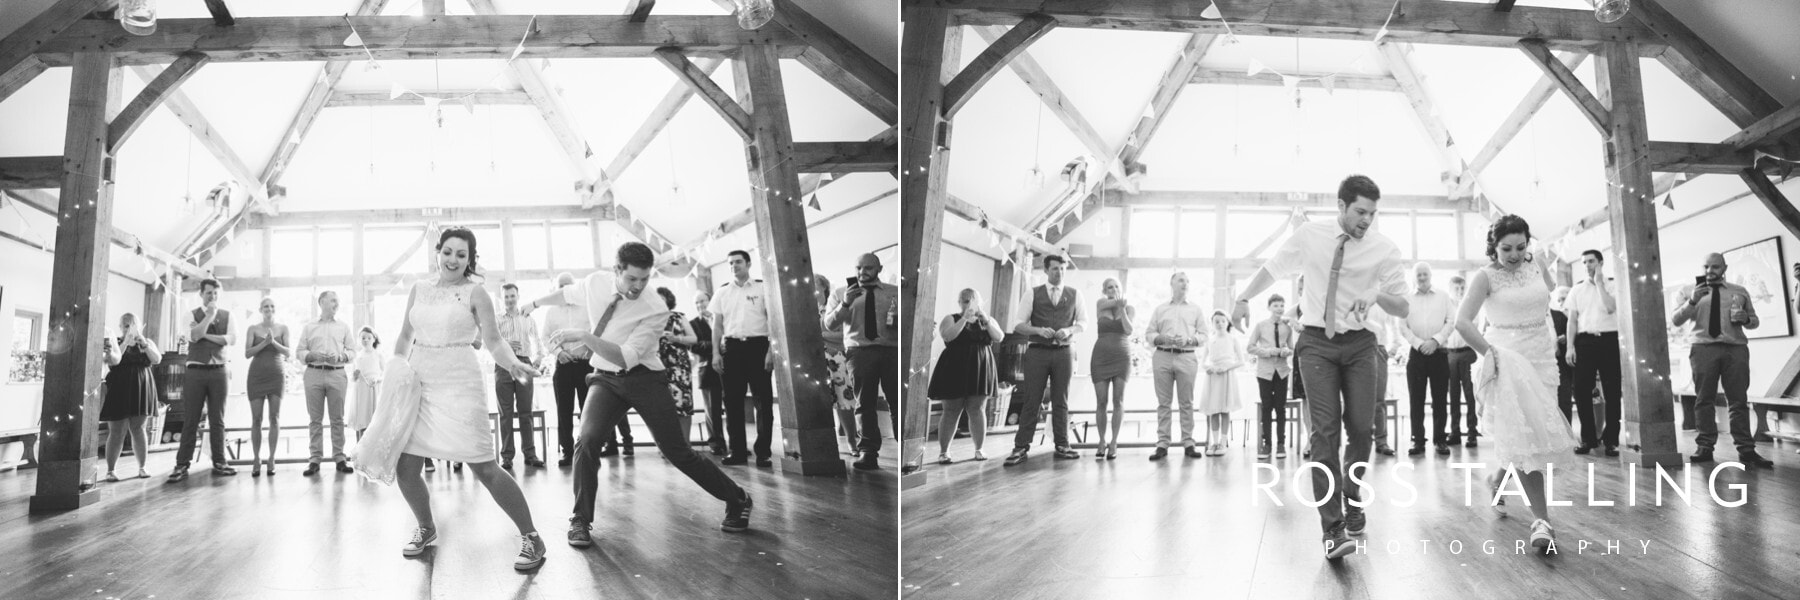 Coolest First Dance Ever Breakdancing Bride and Groom Jasmin and Ben Barnicoat_0005